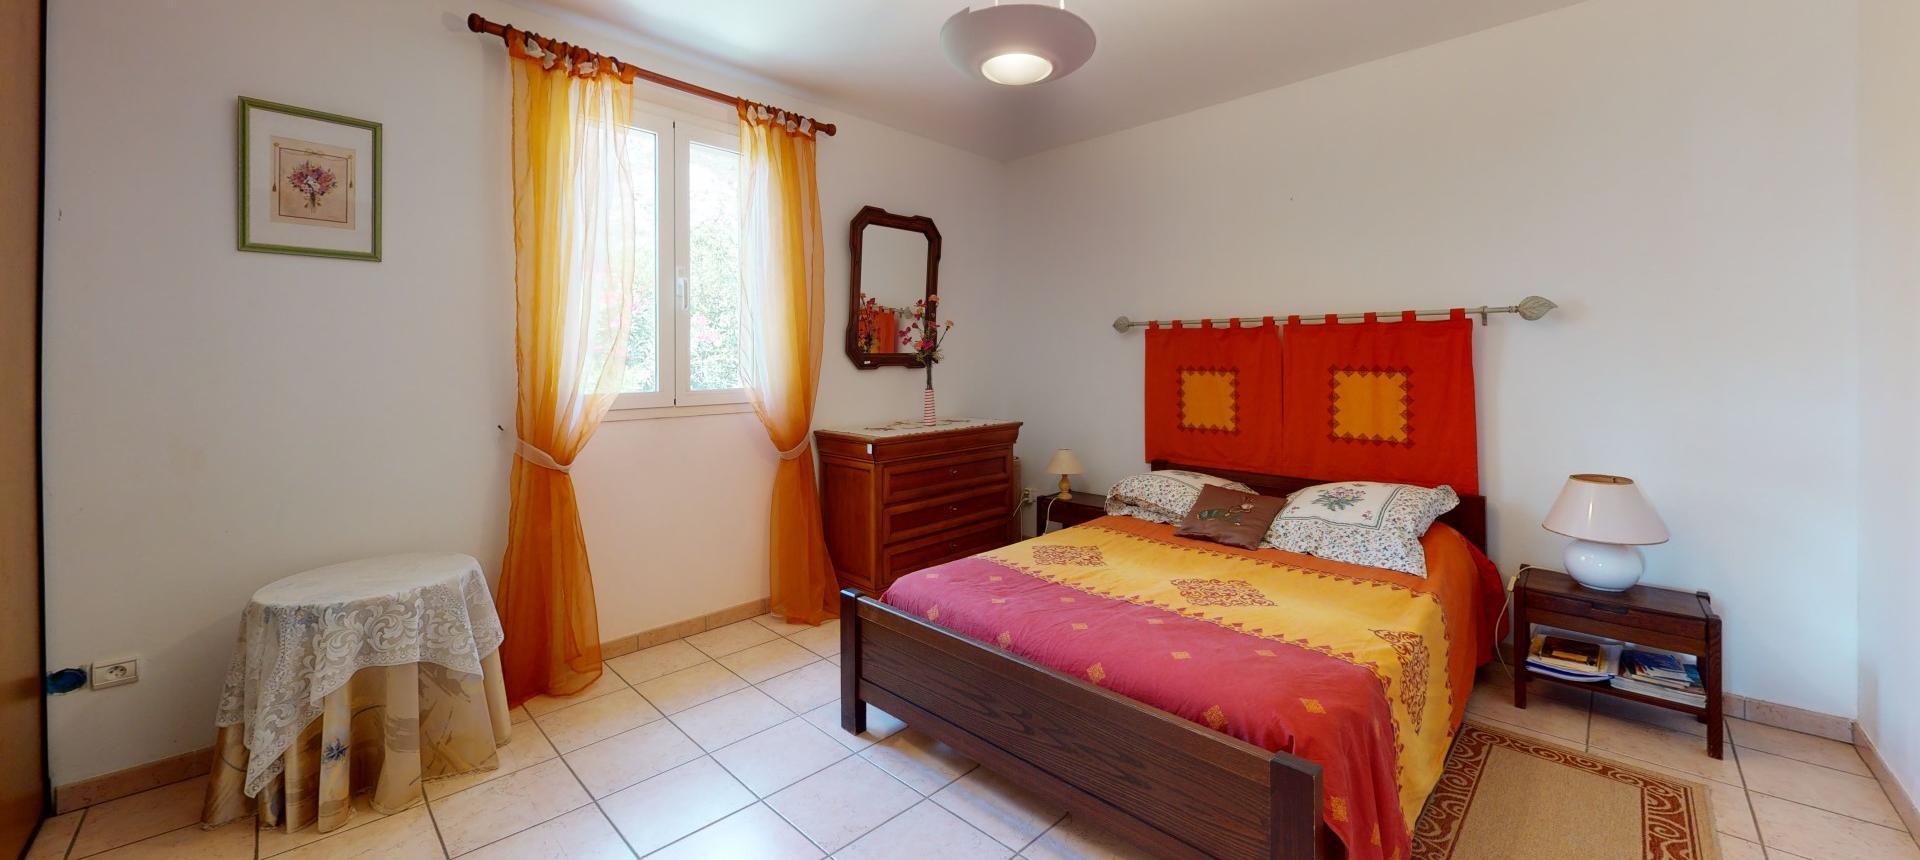 A vendre villa avec vue dégagée proche Ajaccio - AFA- CHAMBRE RDC